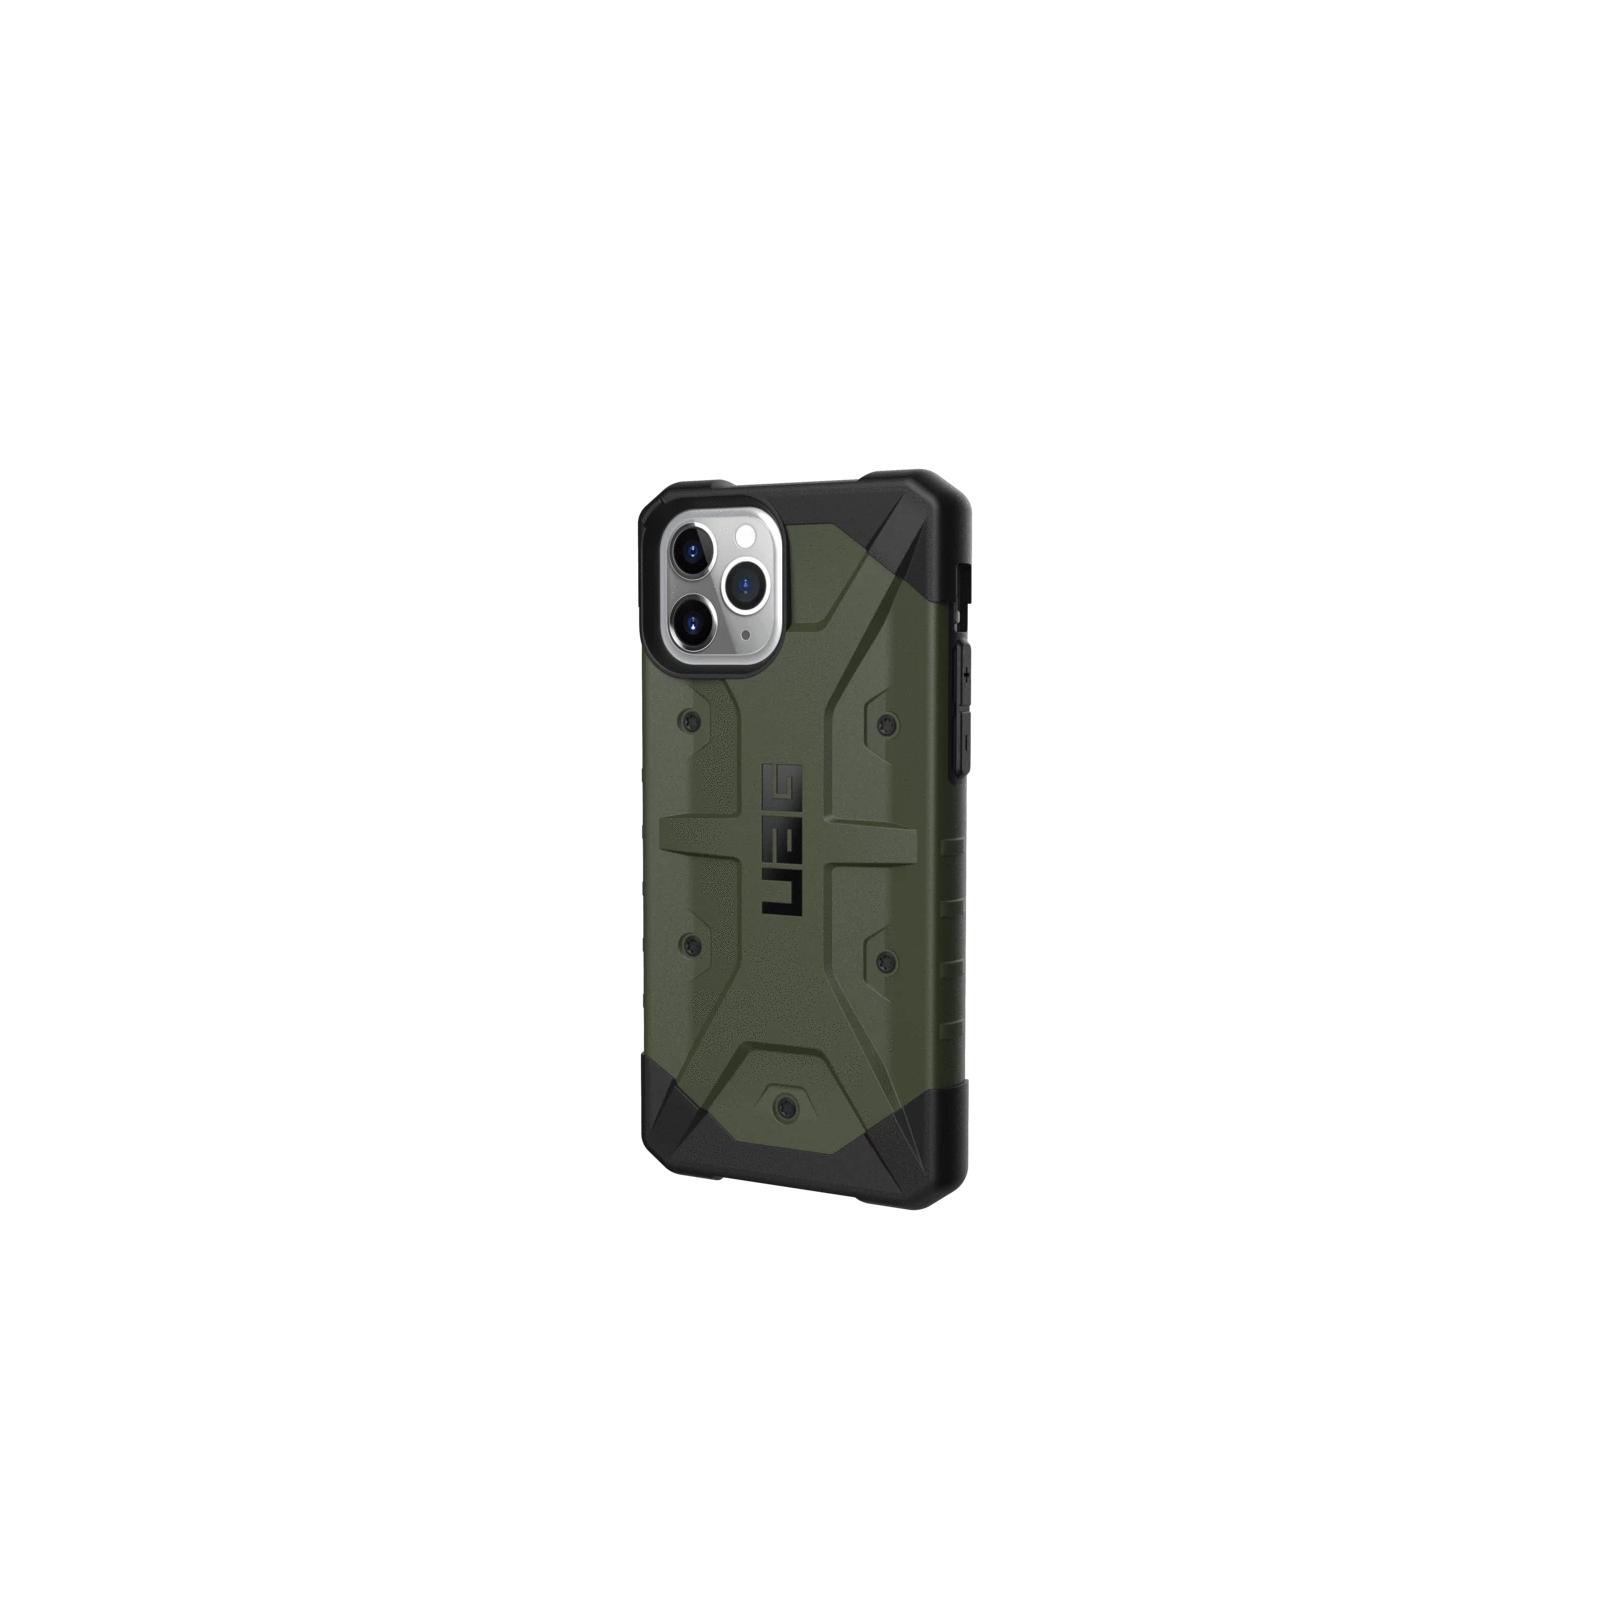 Чехол для моб. телефона Uag iPhone 11 Pro Pathfinder, White (111707114141) изображение 2